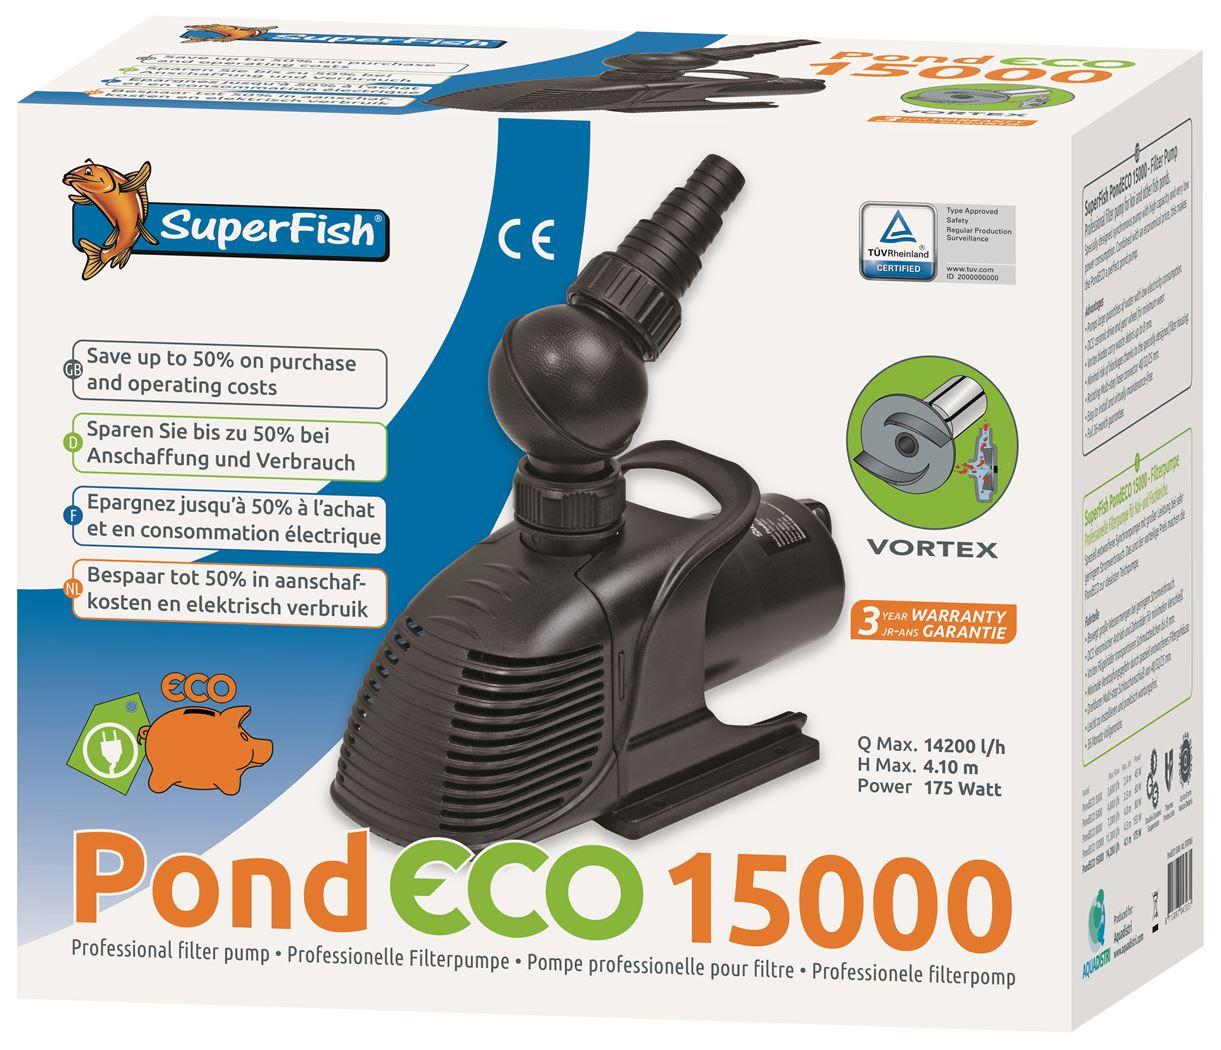 vijverpomp superfish pond eco 15000